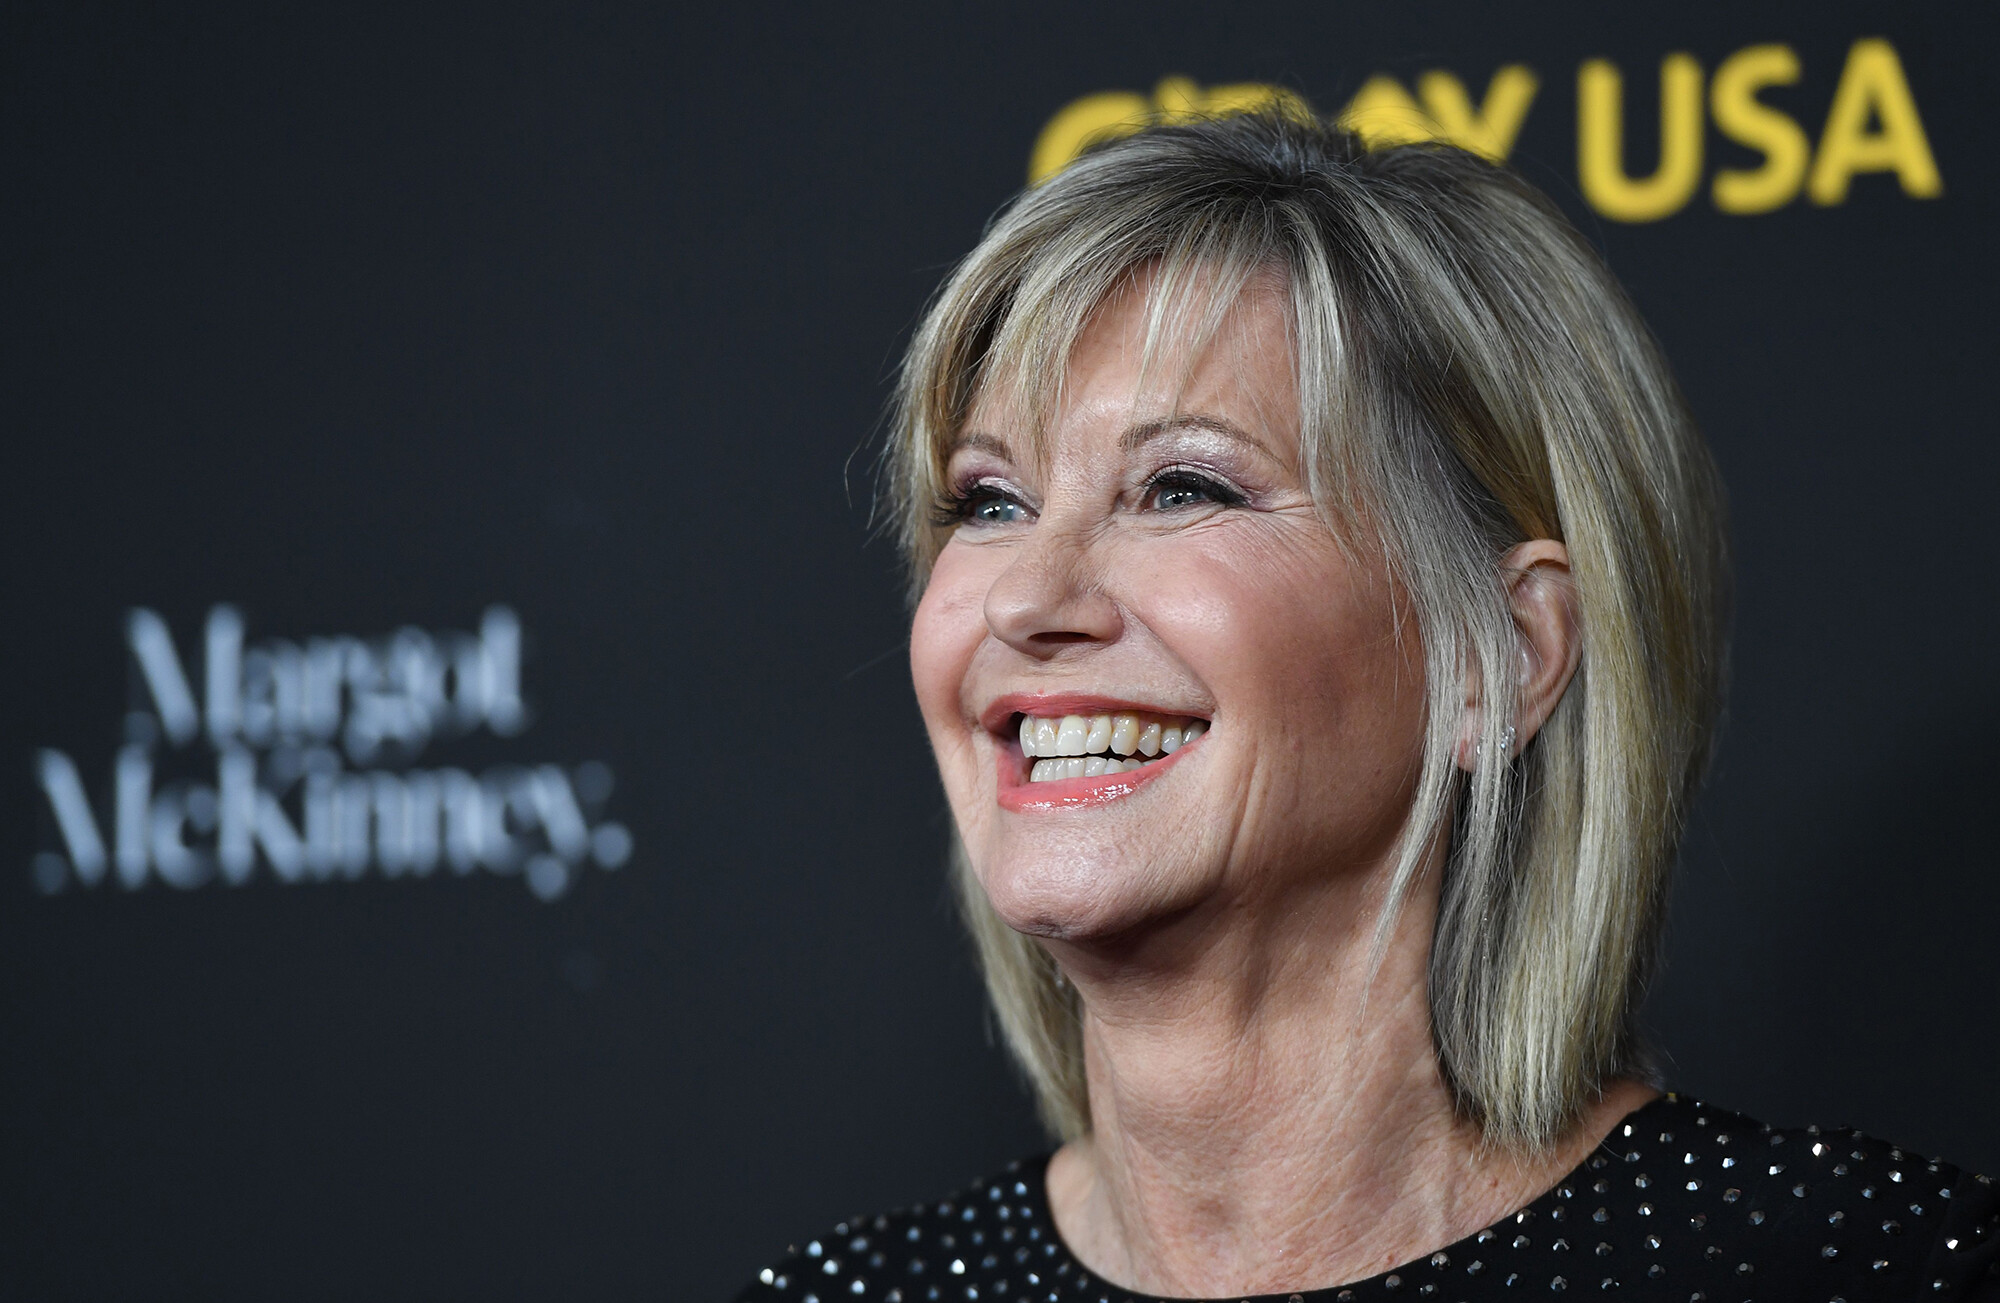 Olivia Newton-John offers cancer update